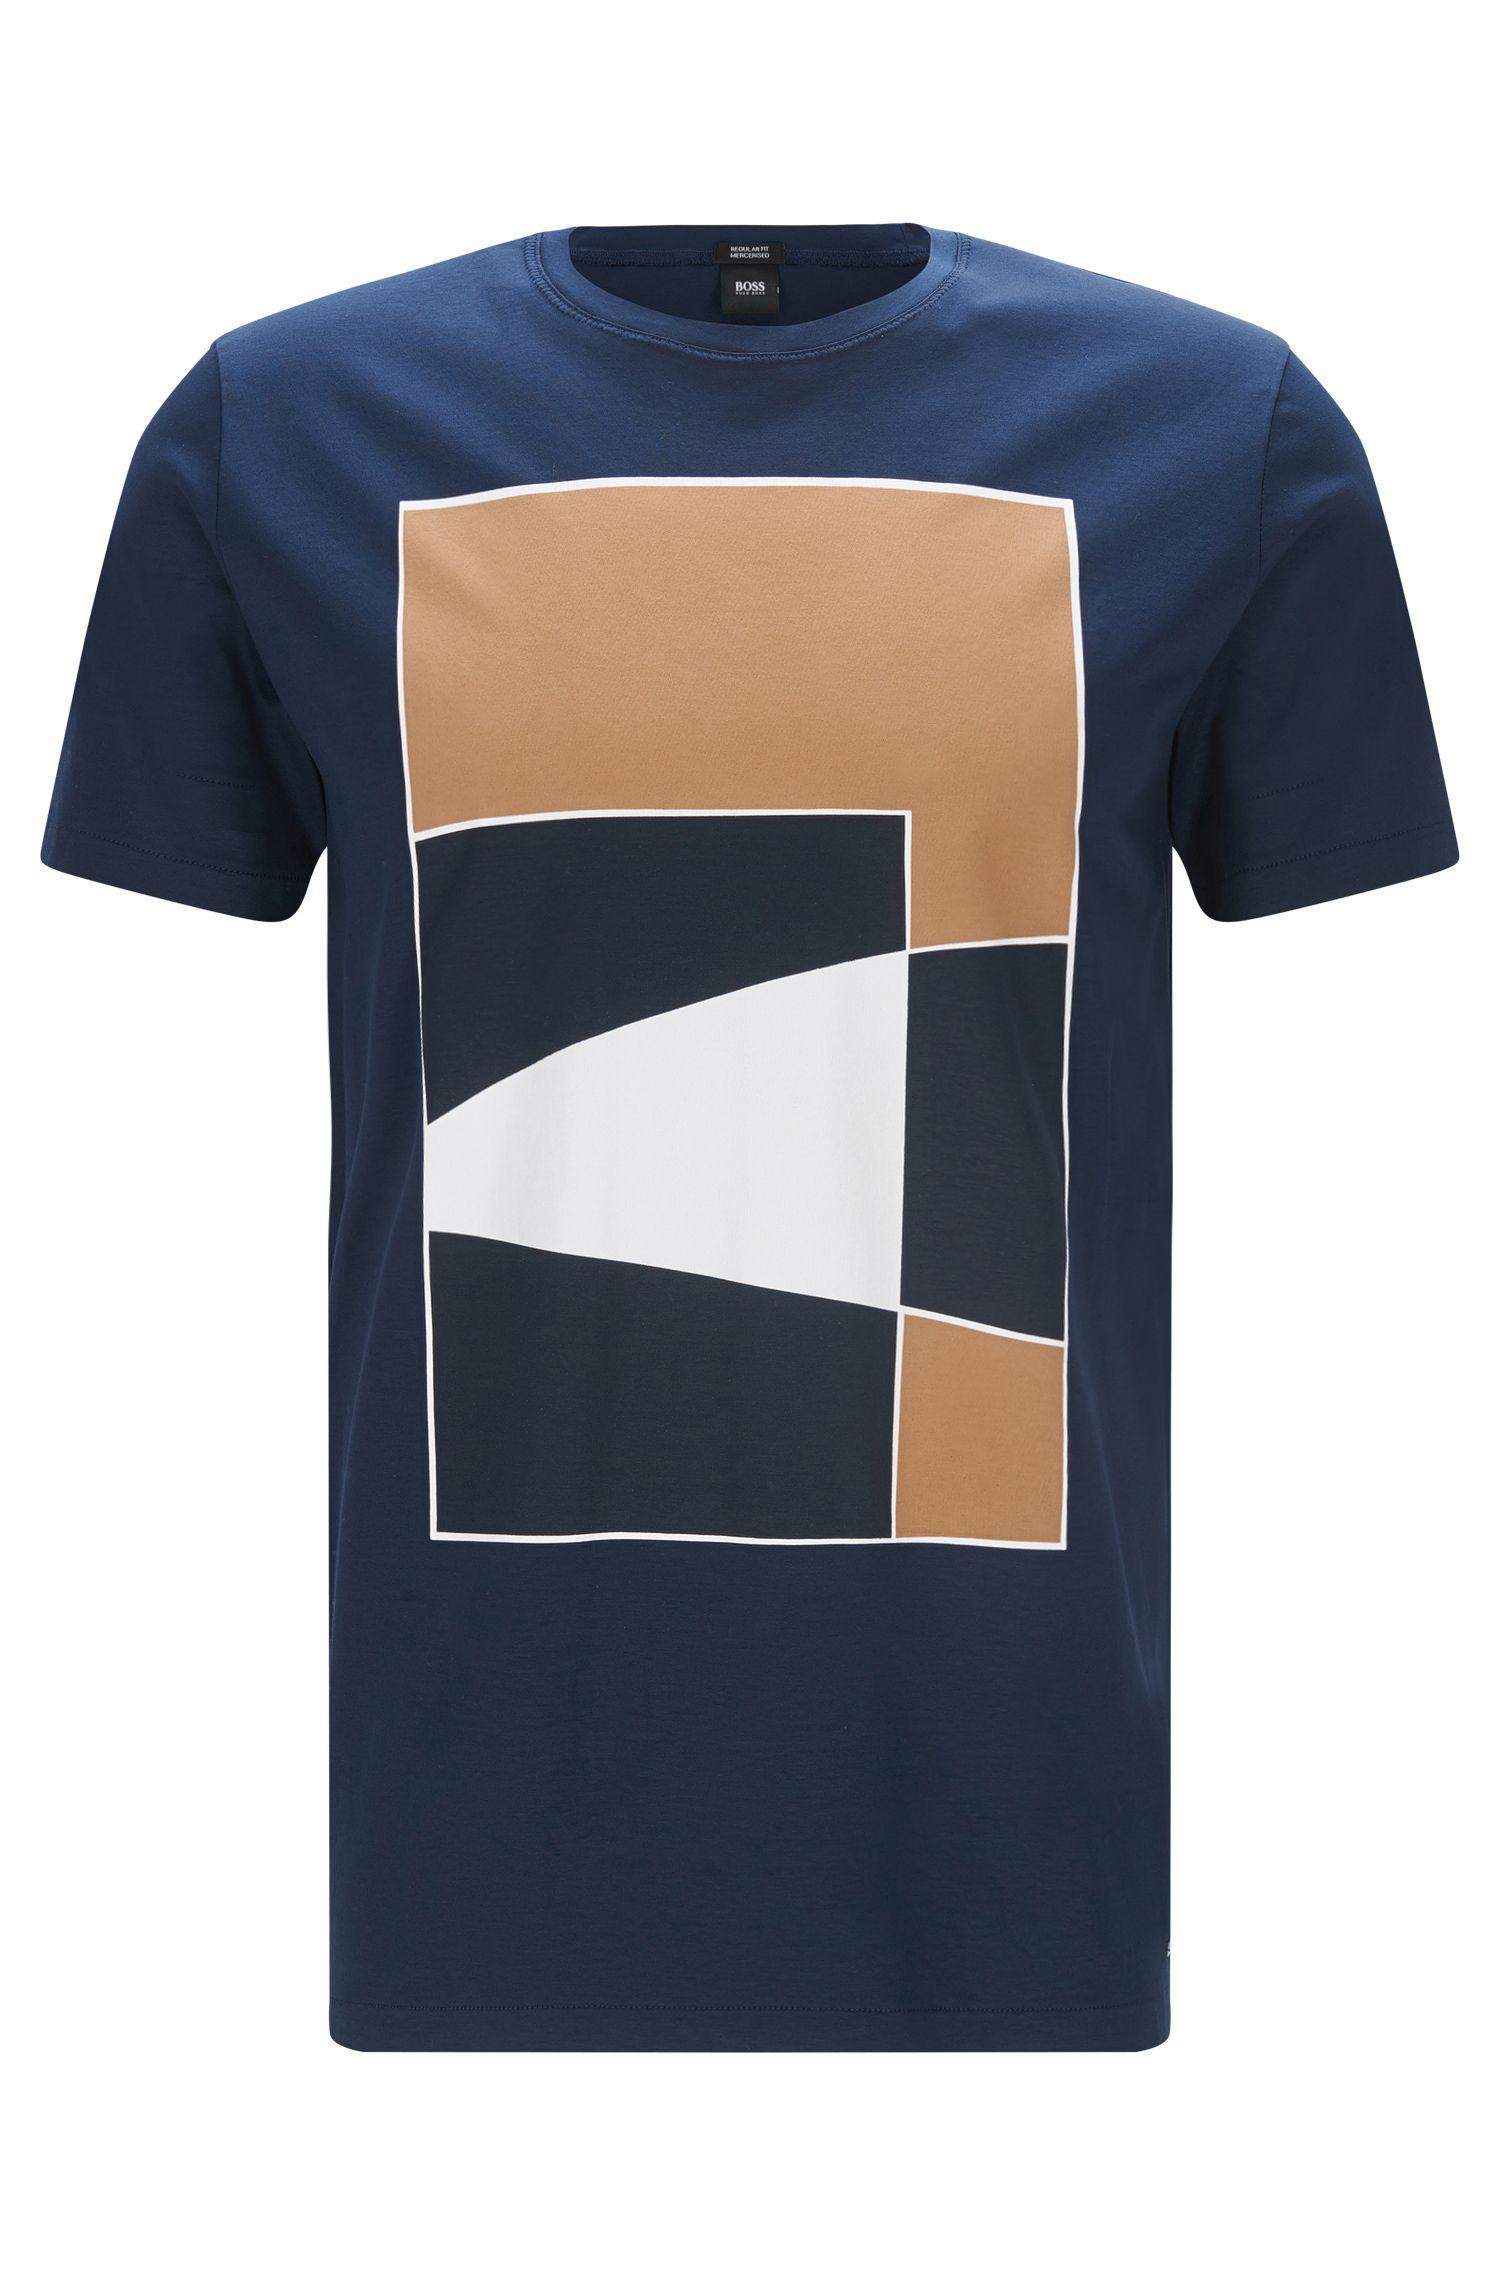 Cotton Graphic T-Shirt | Tilburt